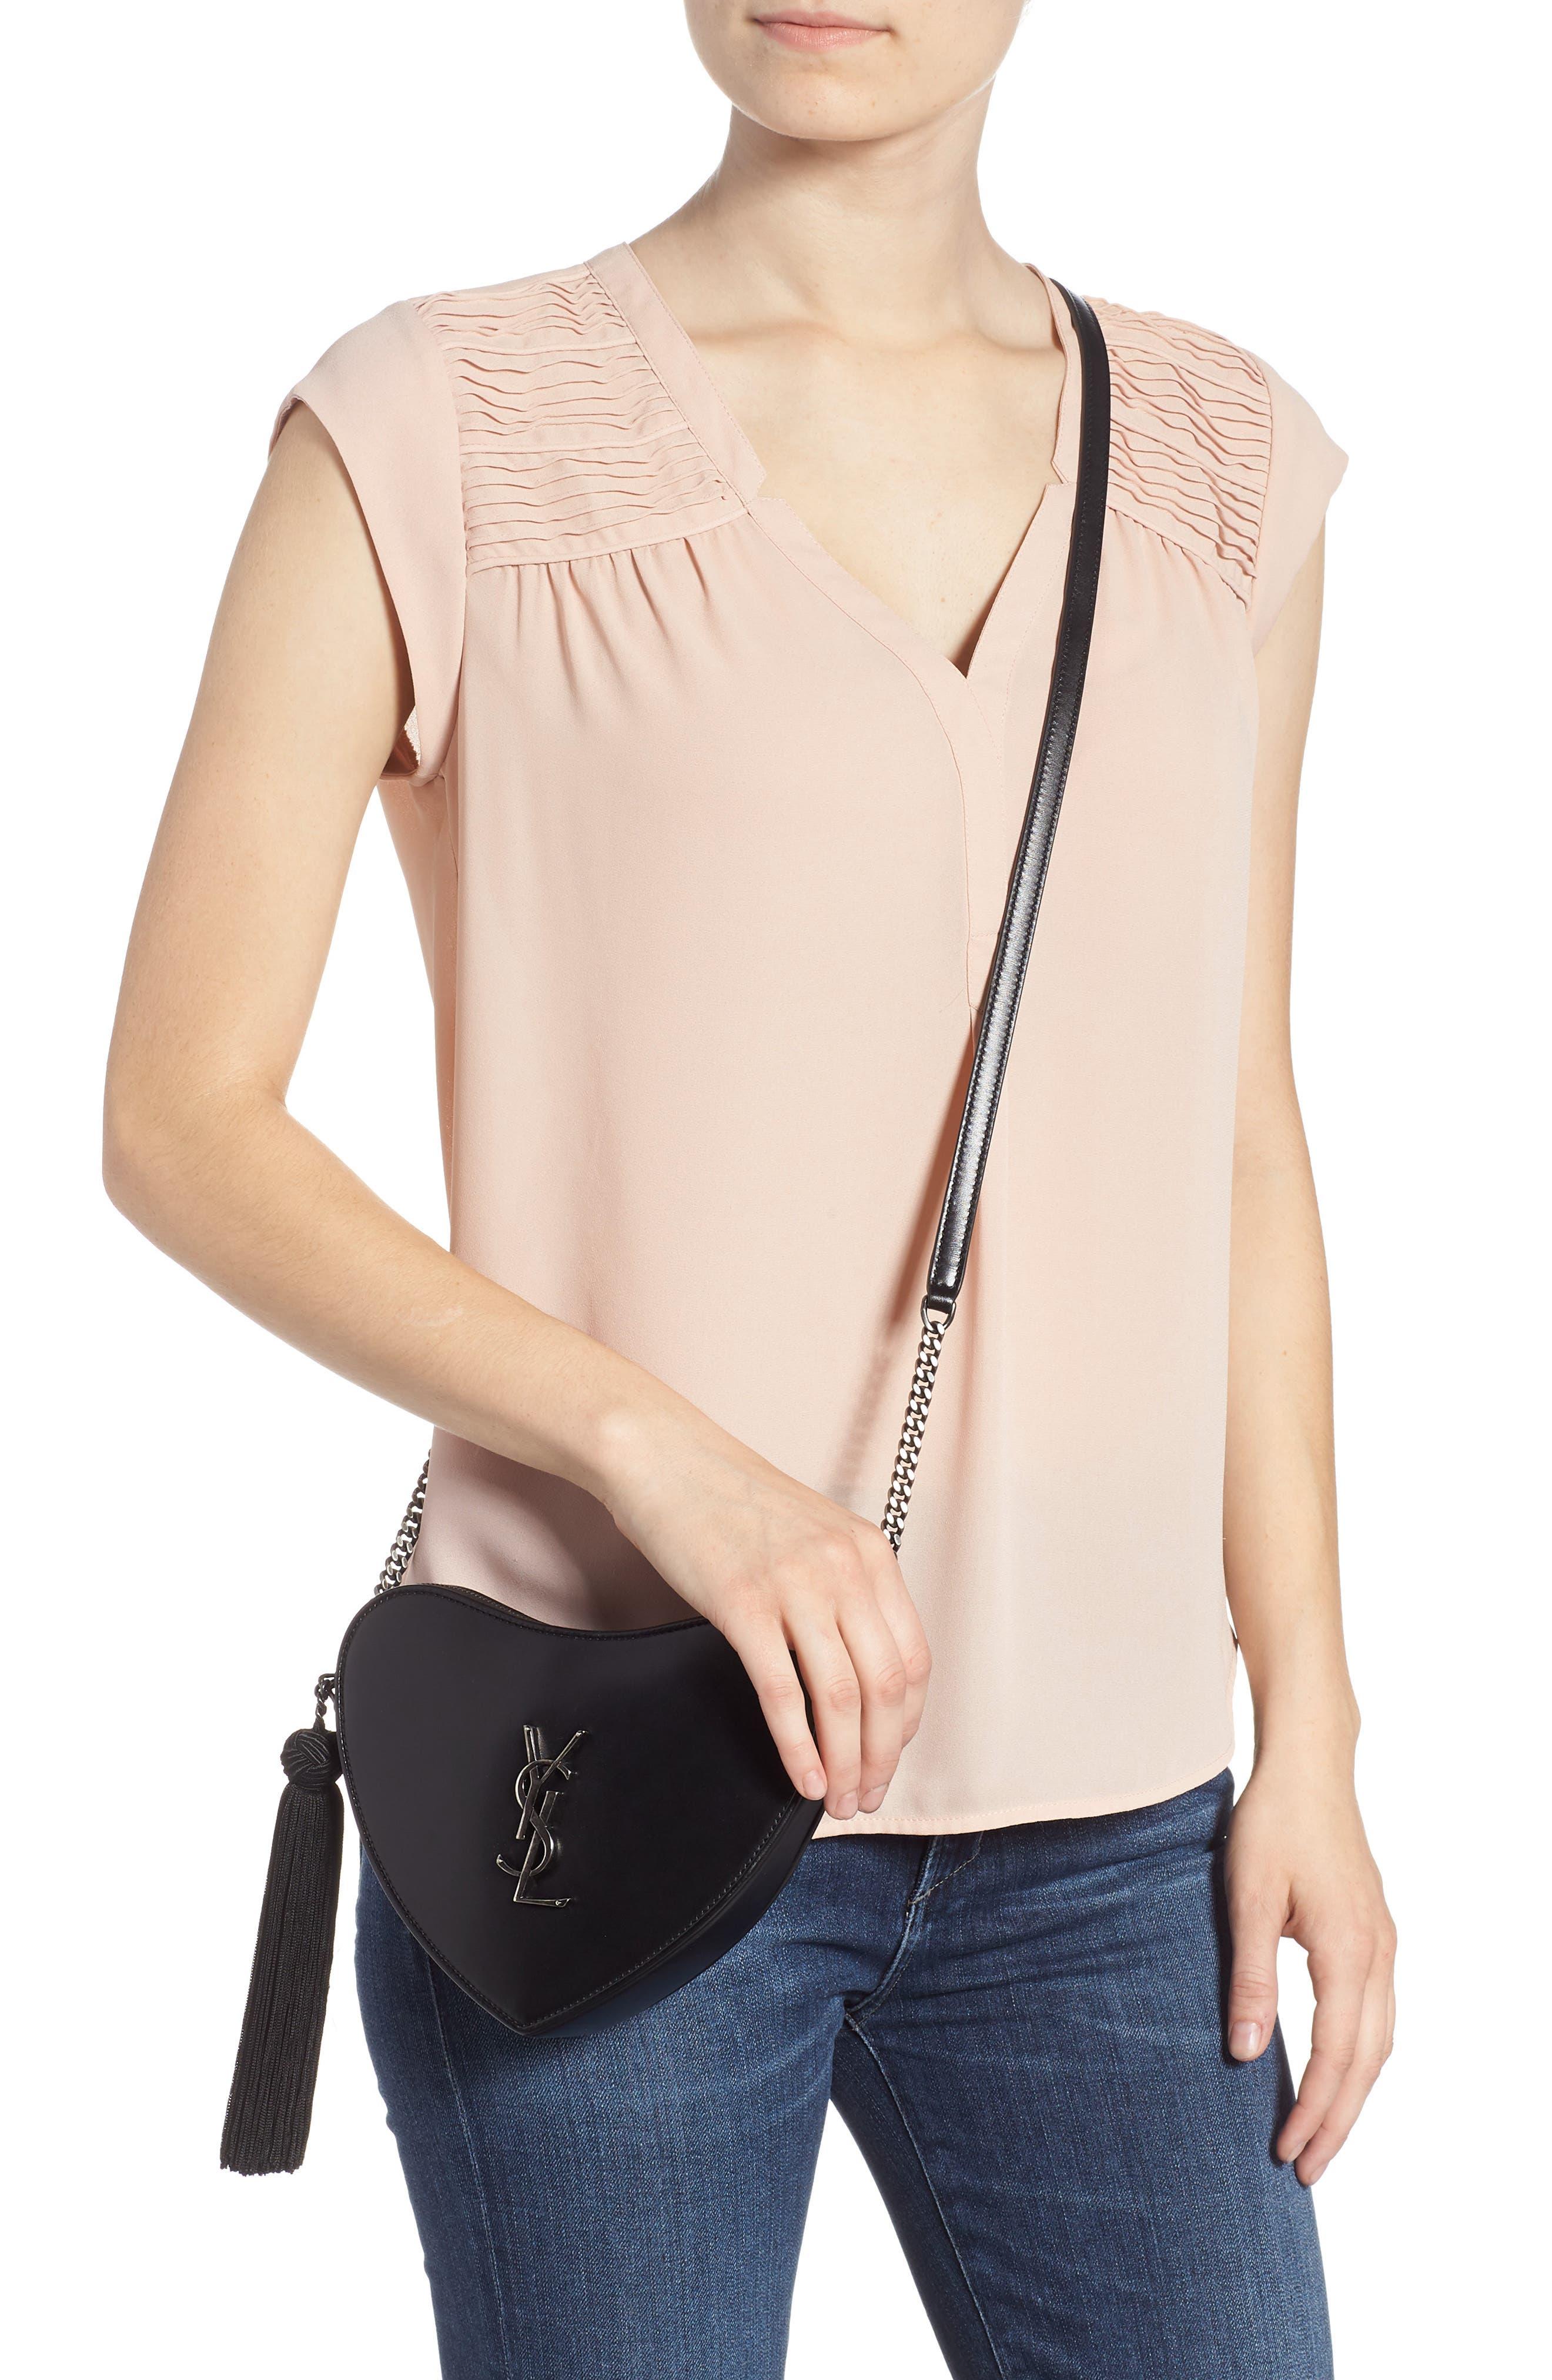 Sac Coeur Leather Crossbody Bag,                             Alternate thumbnail 2, color,                             NOIR/ NOIR